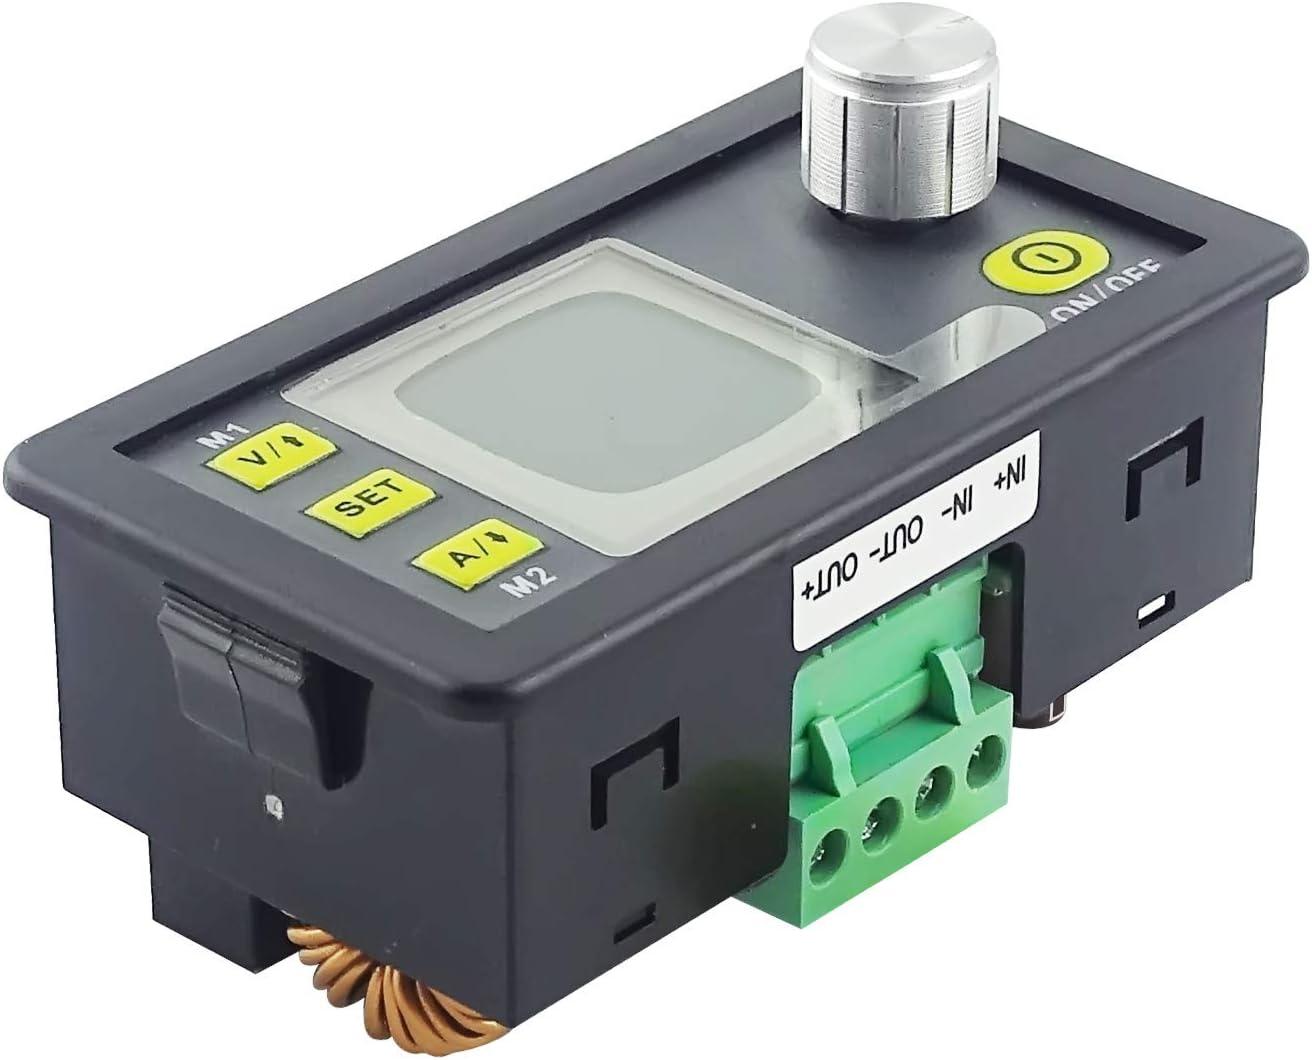 RD DPS3005 32V 5A 160W Constant DC DC Voltage Current Step Down Power Supply Module Buck Voltage Converter Voltmeter (DPS3005)